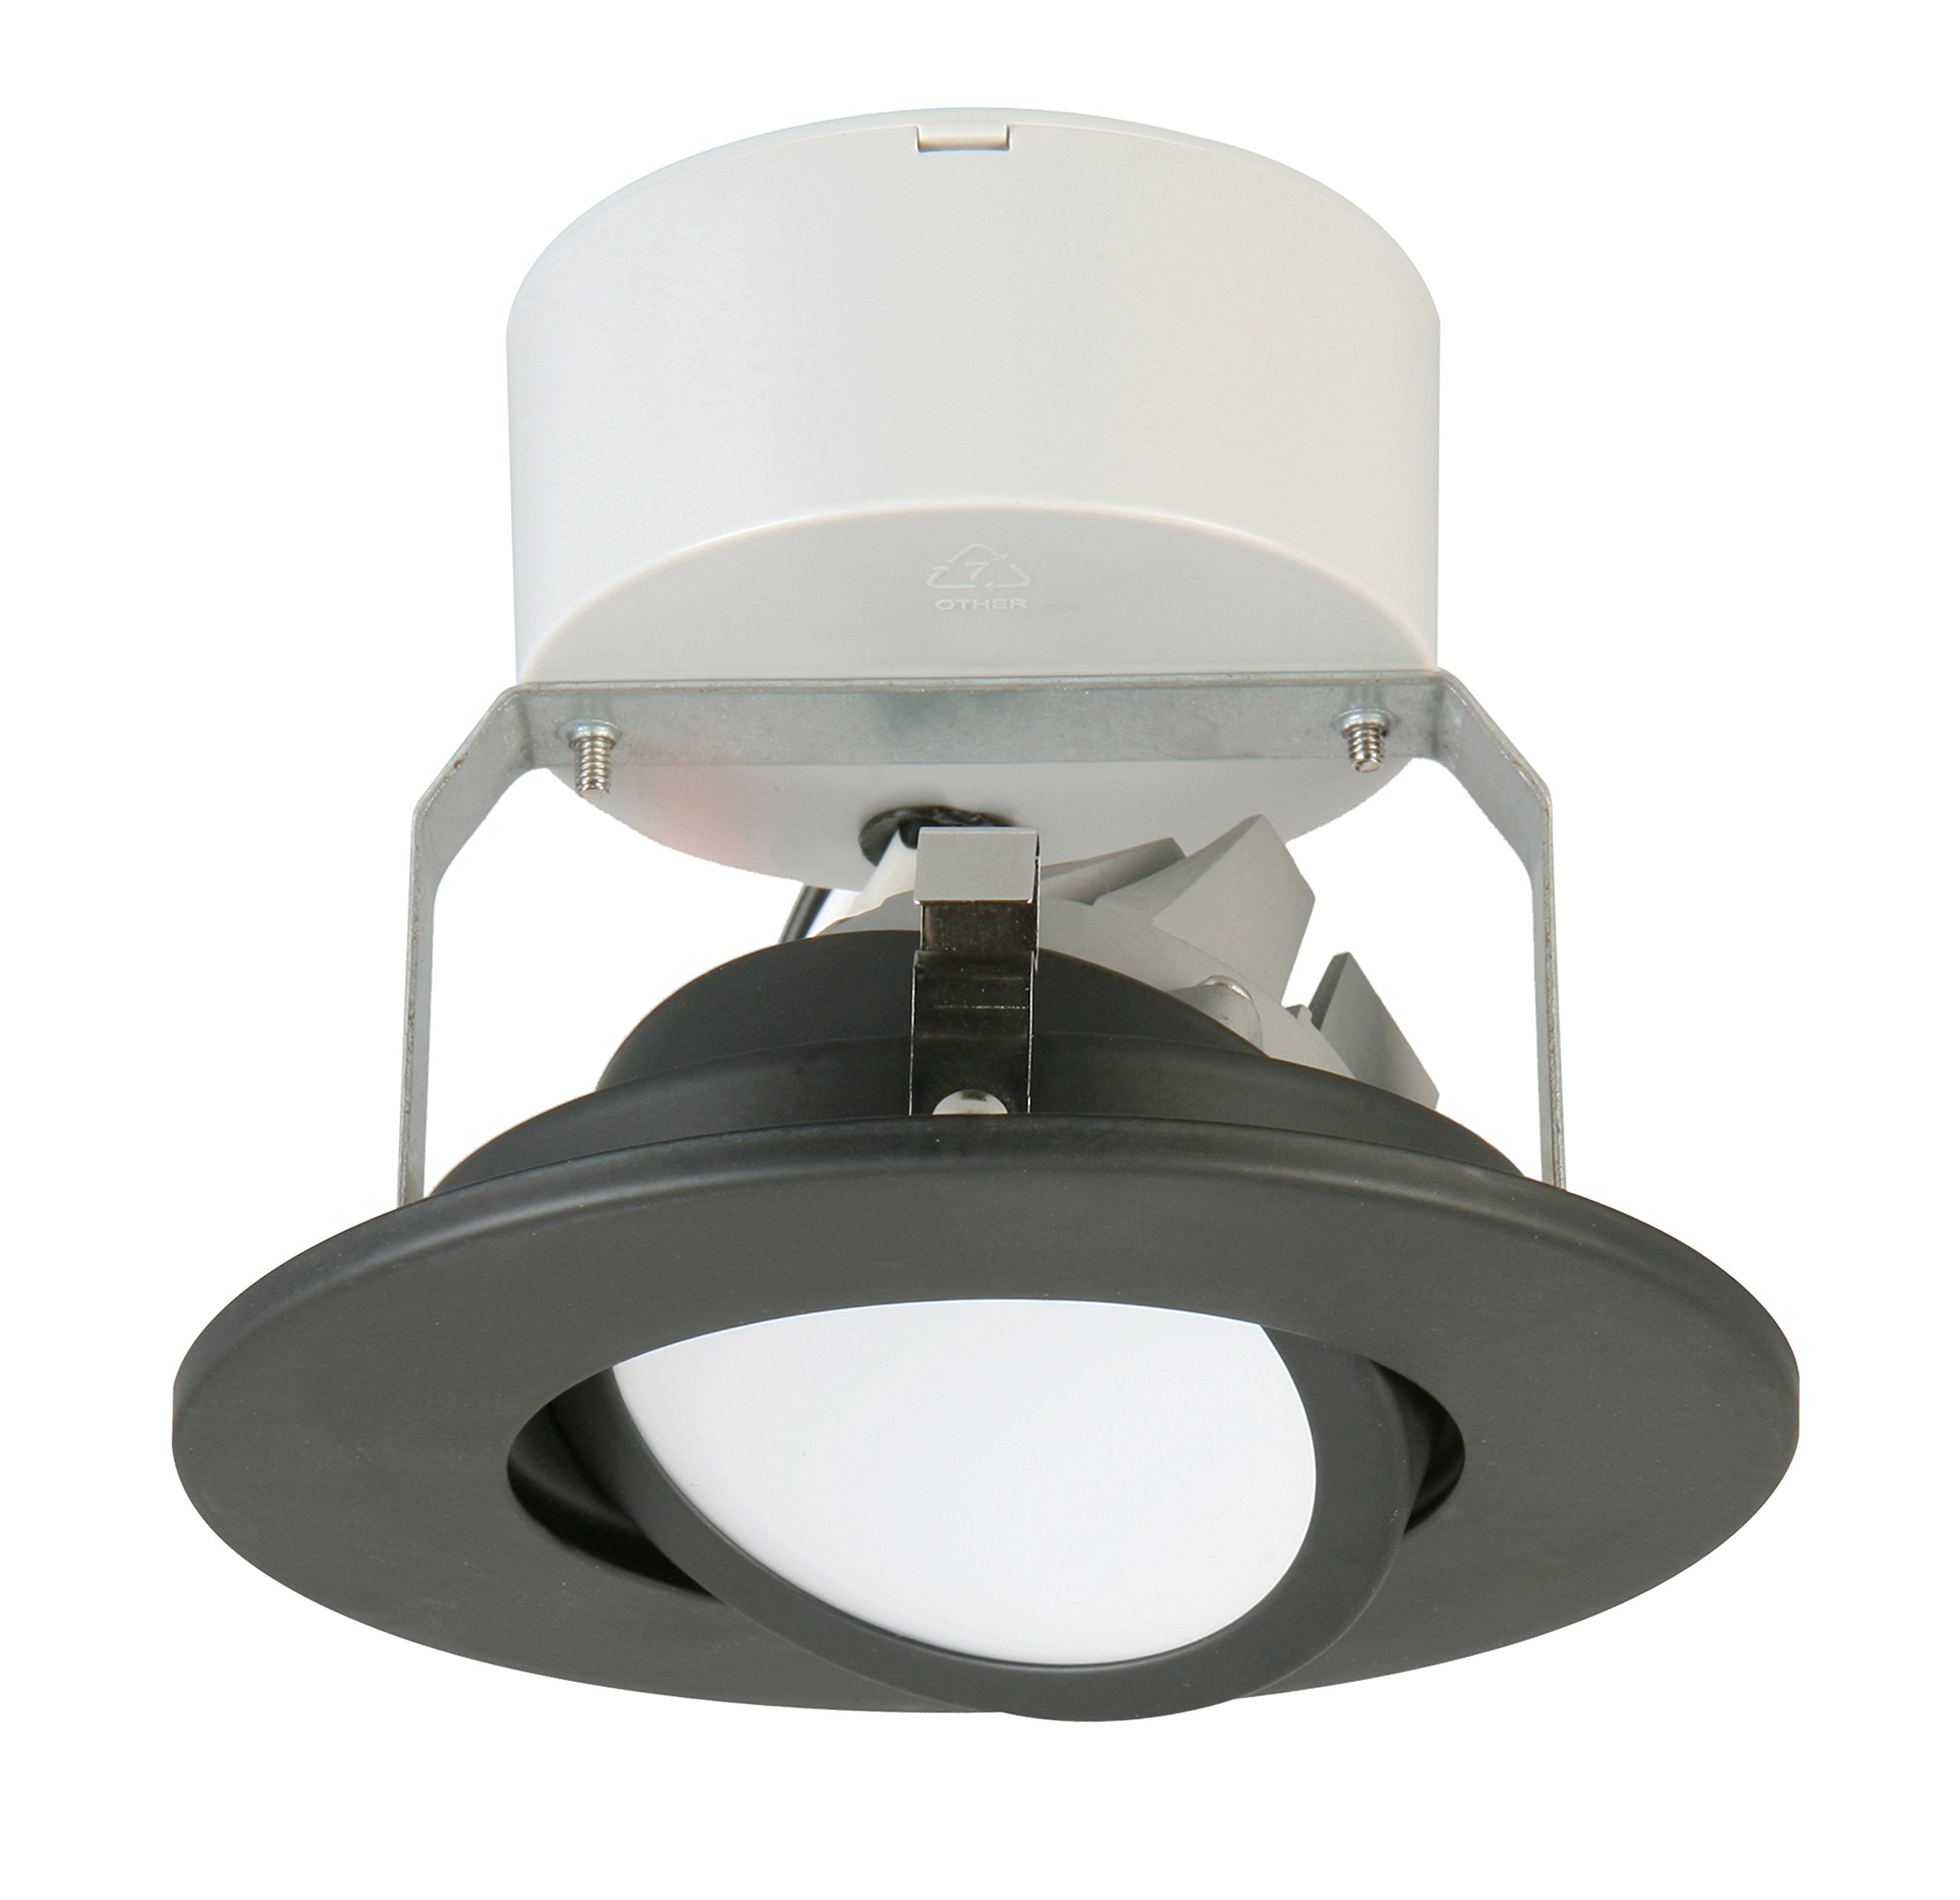 Lithonia Lighting 4 Inch LED Gimbal, Matte Black, Higher Lumen Version